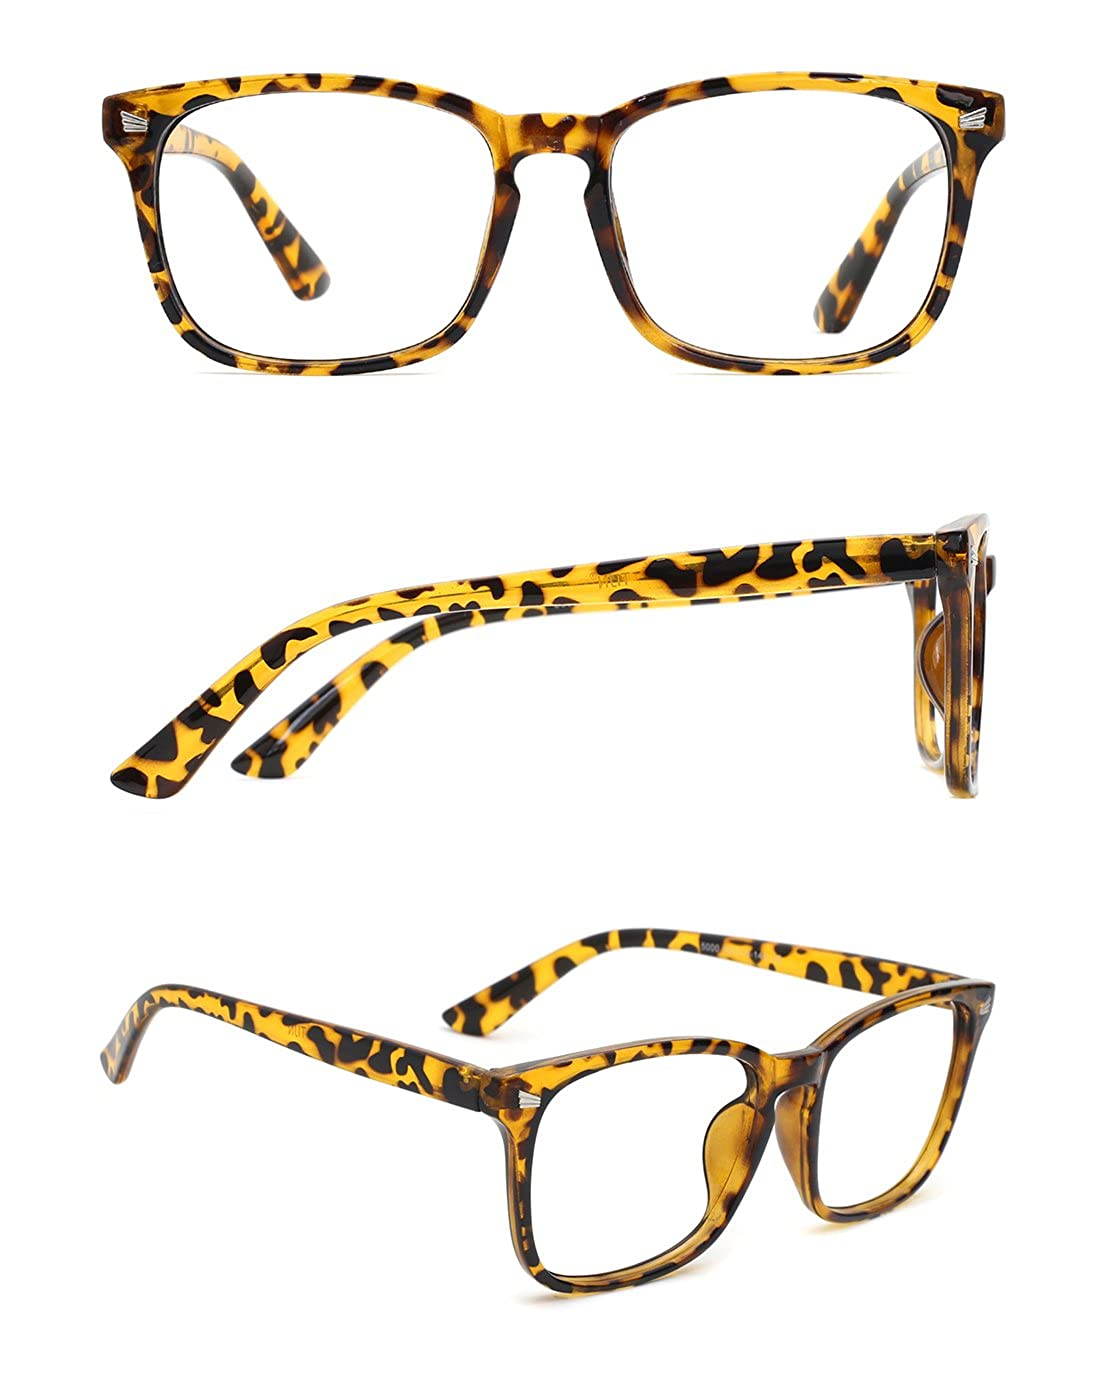 c99042d825 ... TIJN Unisex Stylish Square Non-prescription Eyeglasses Glasses Clear  Lens Eyewear 00005008 ...